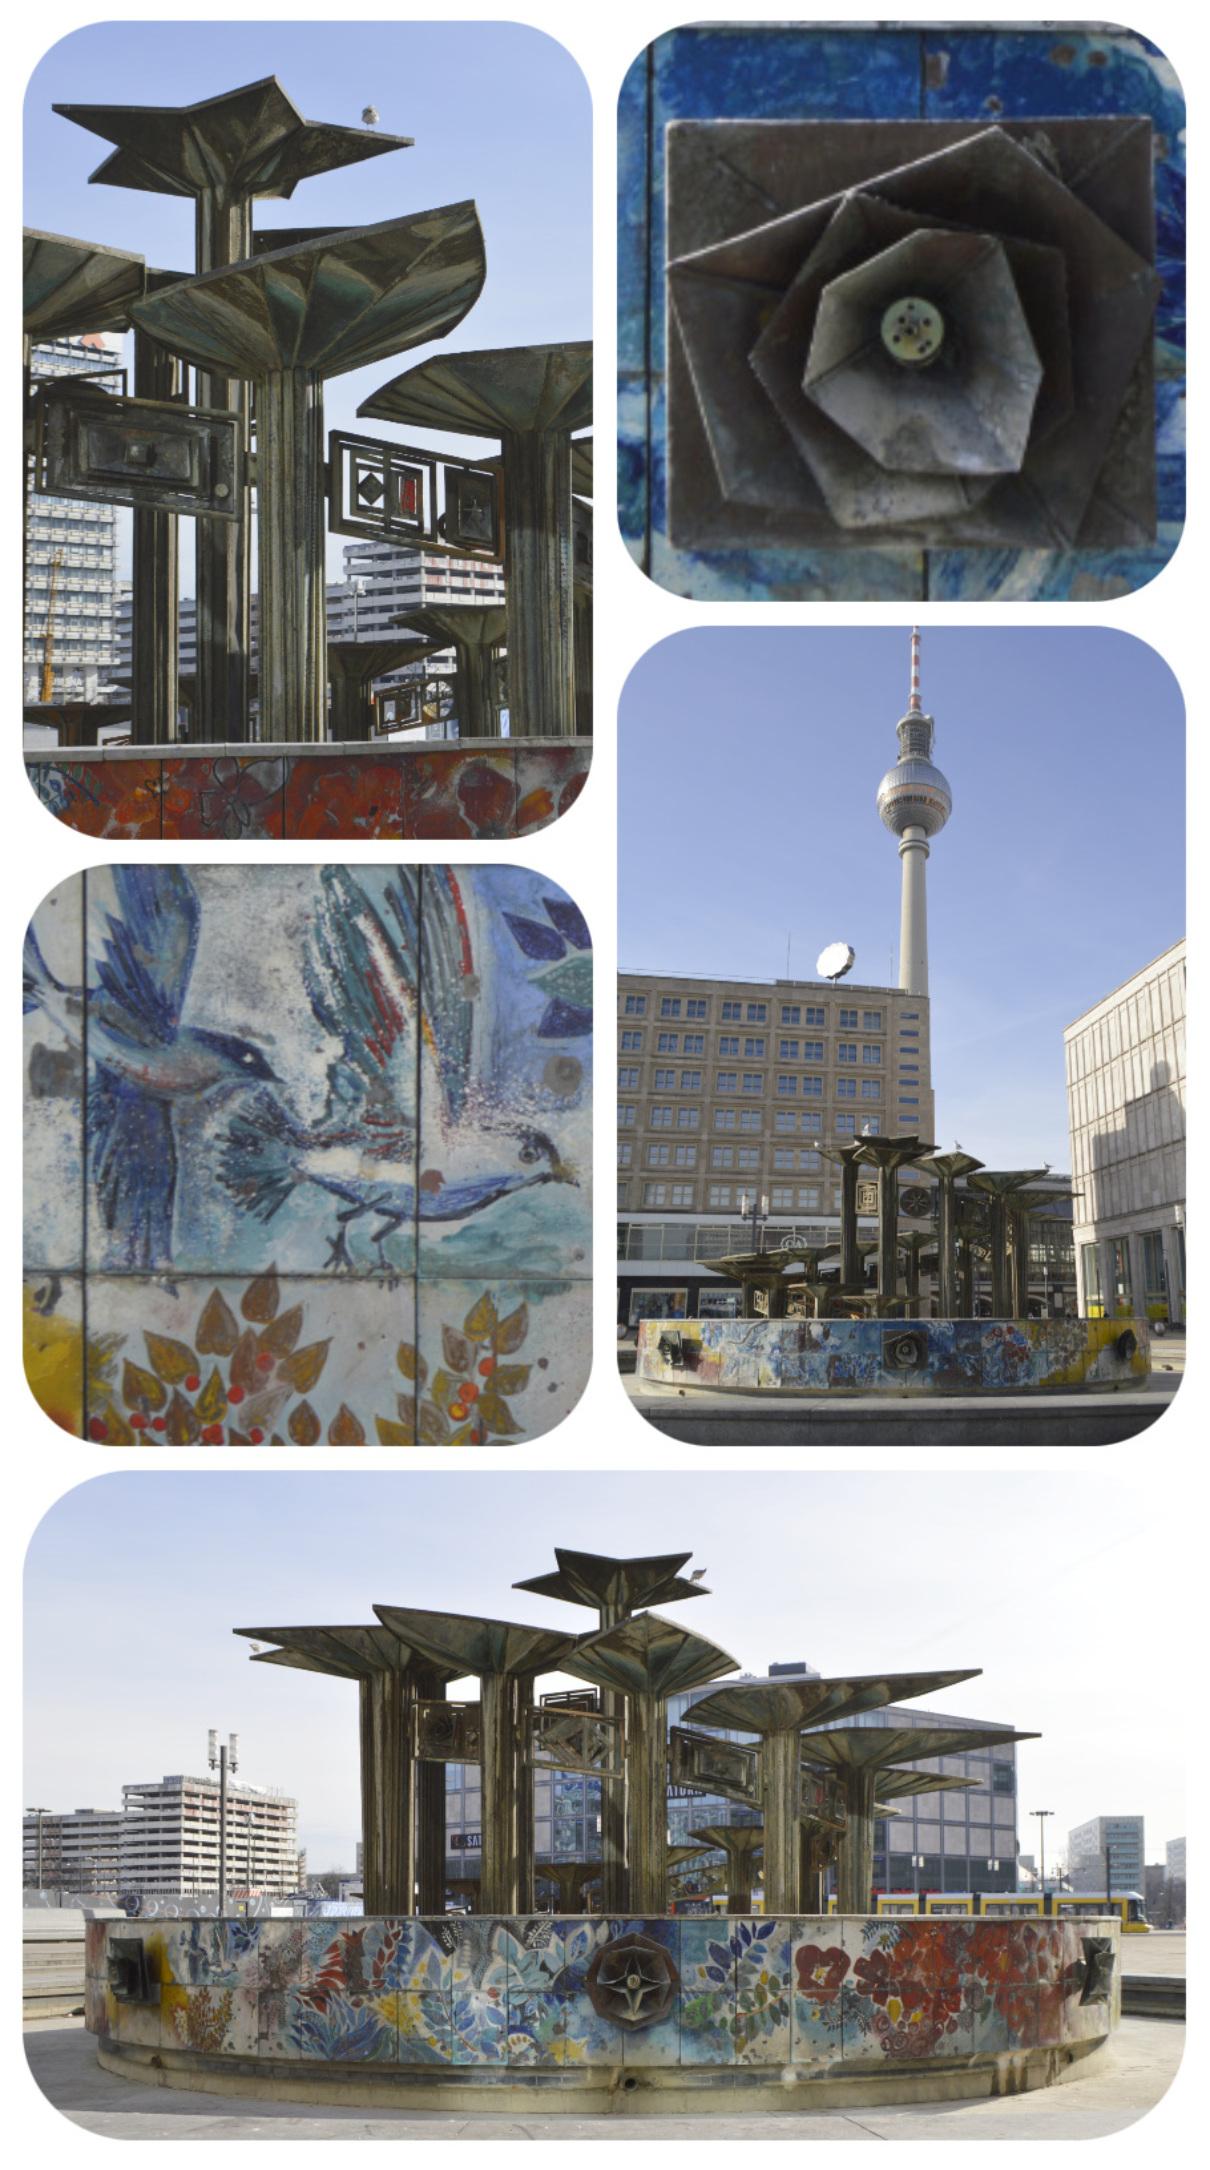 Fountain of the Friendship between Nations Berlin Alexxanderplatz be kitschig blog